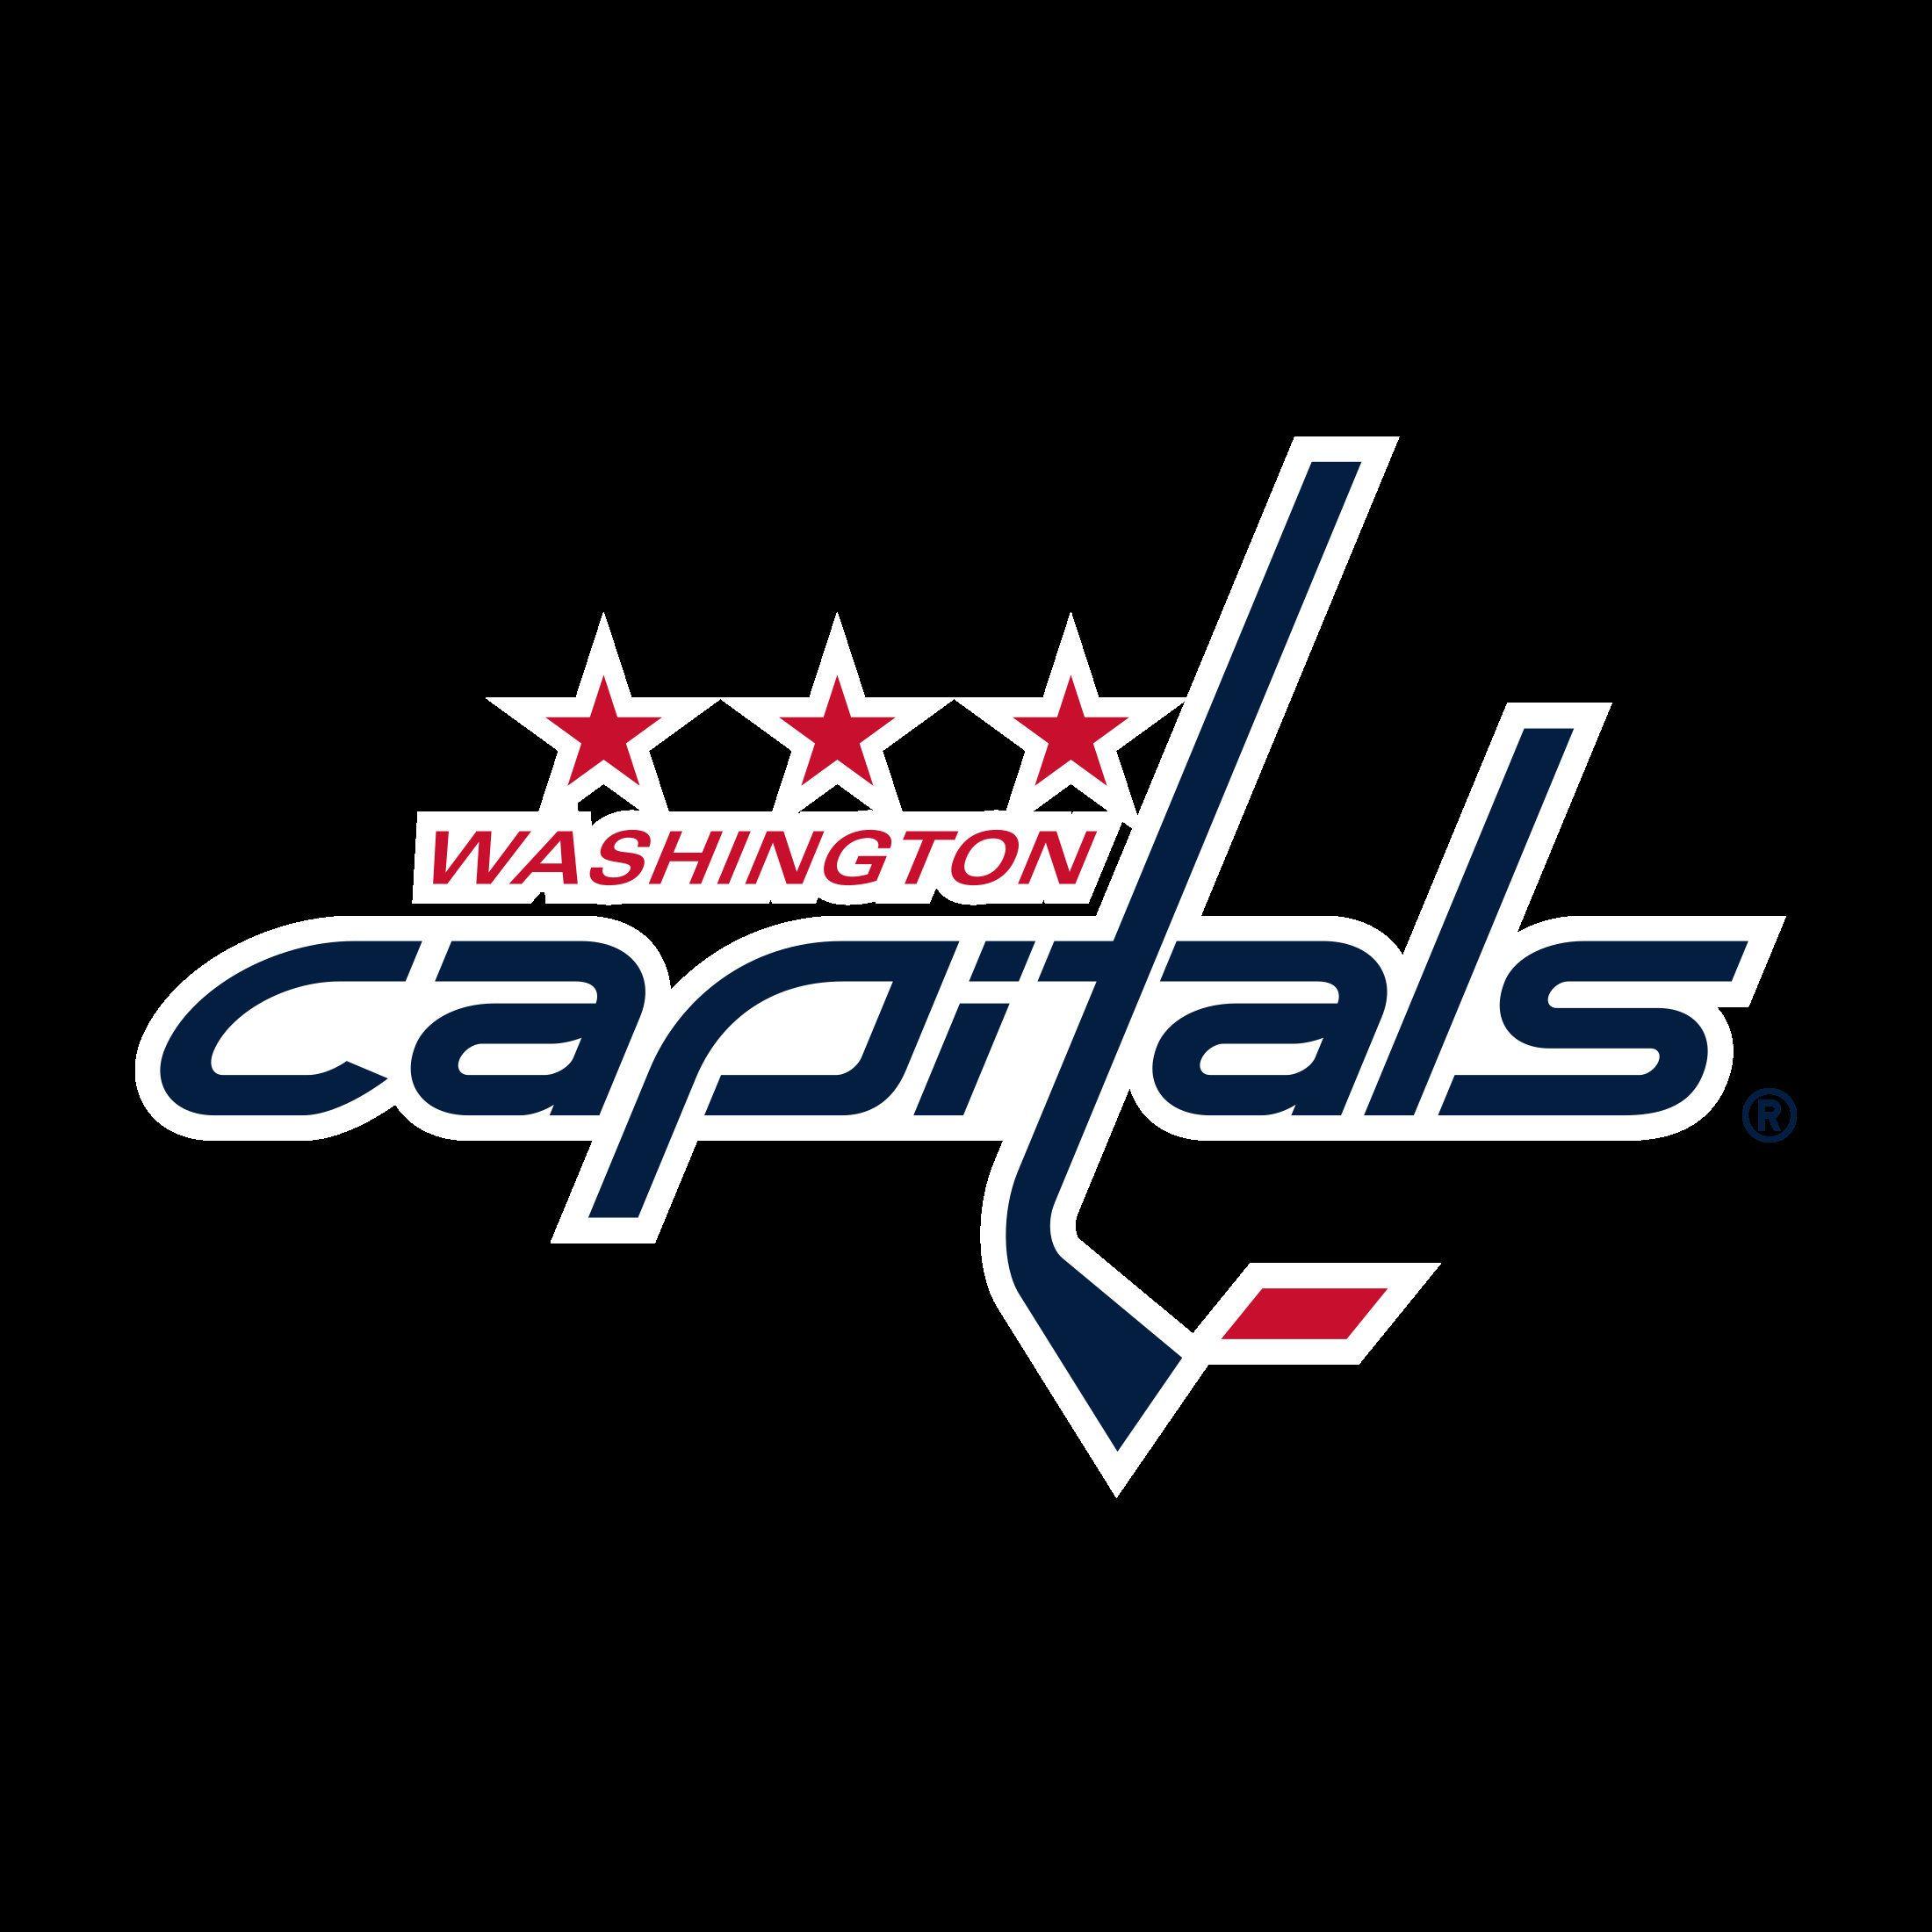 Washington Capitals Nhl Logo Logo Svg Eps Png Jpg Pdf Etsy Nhl Logos Washington Capitals Nhl